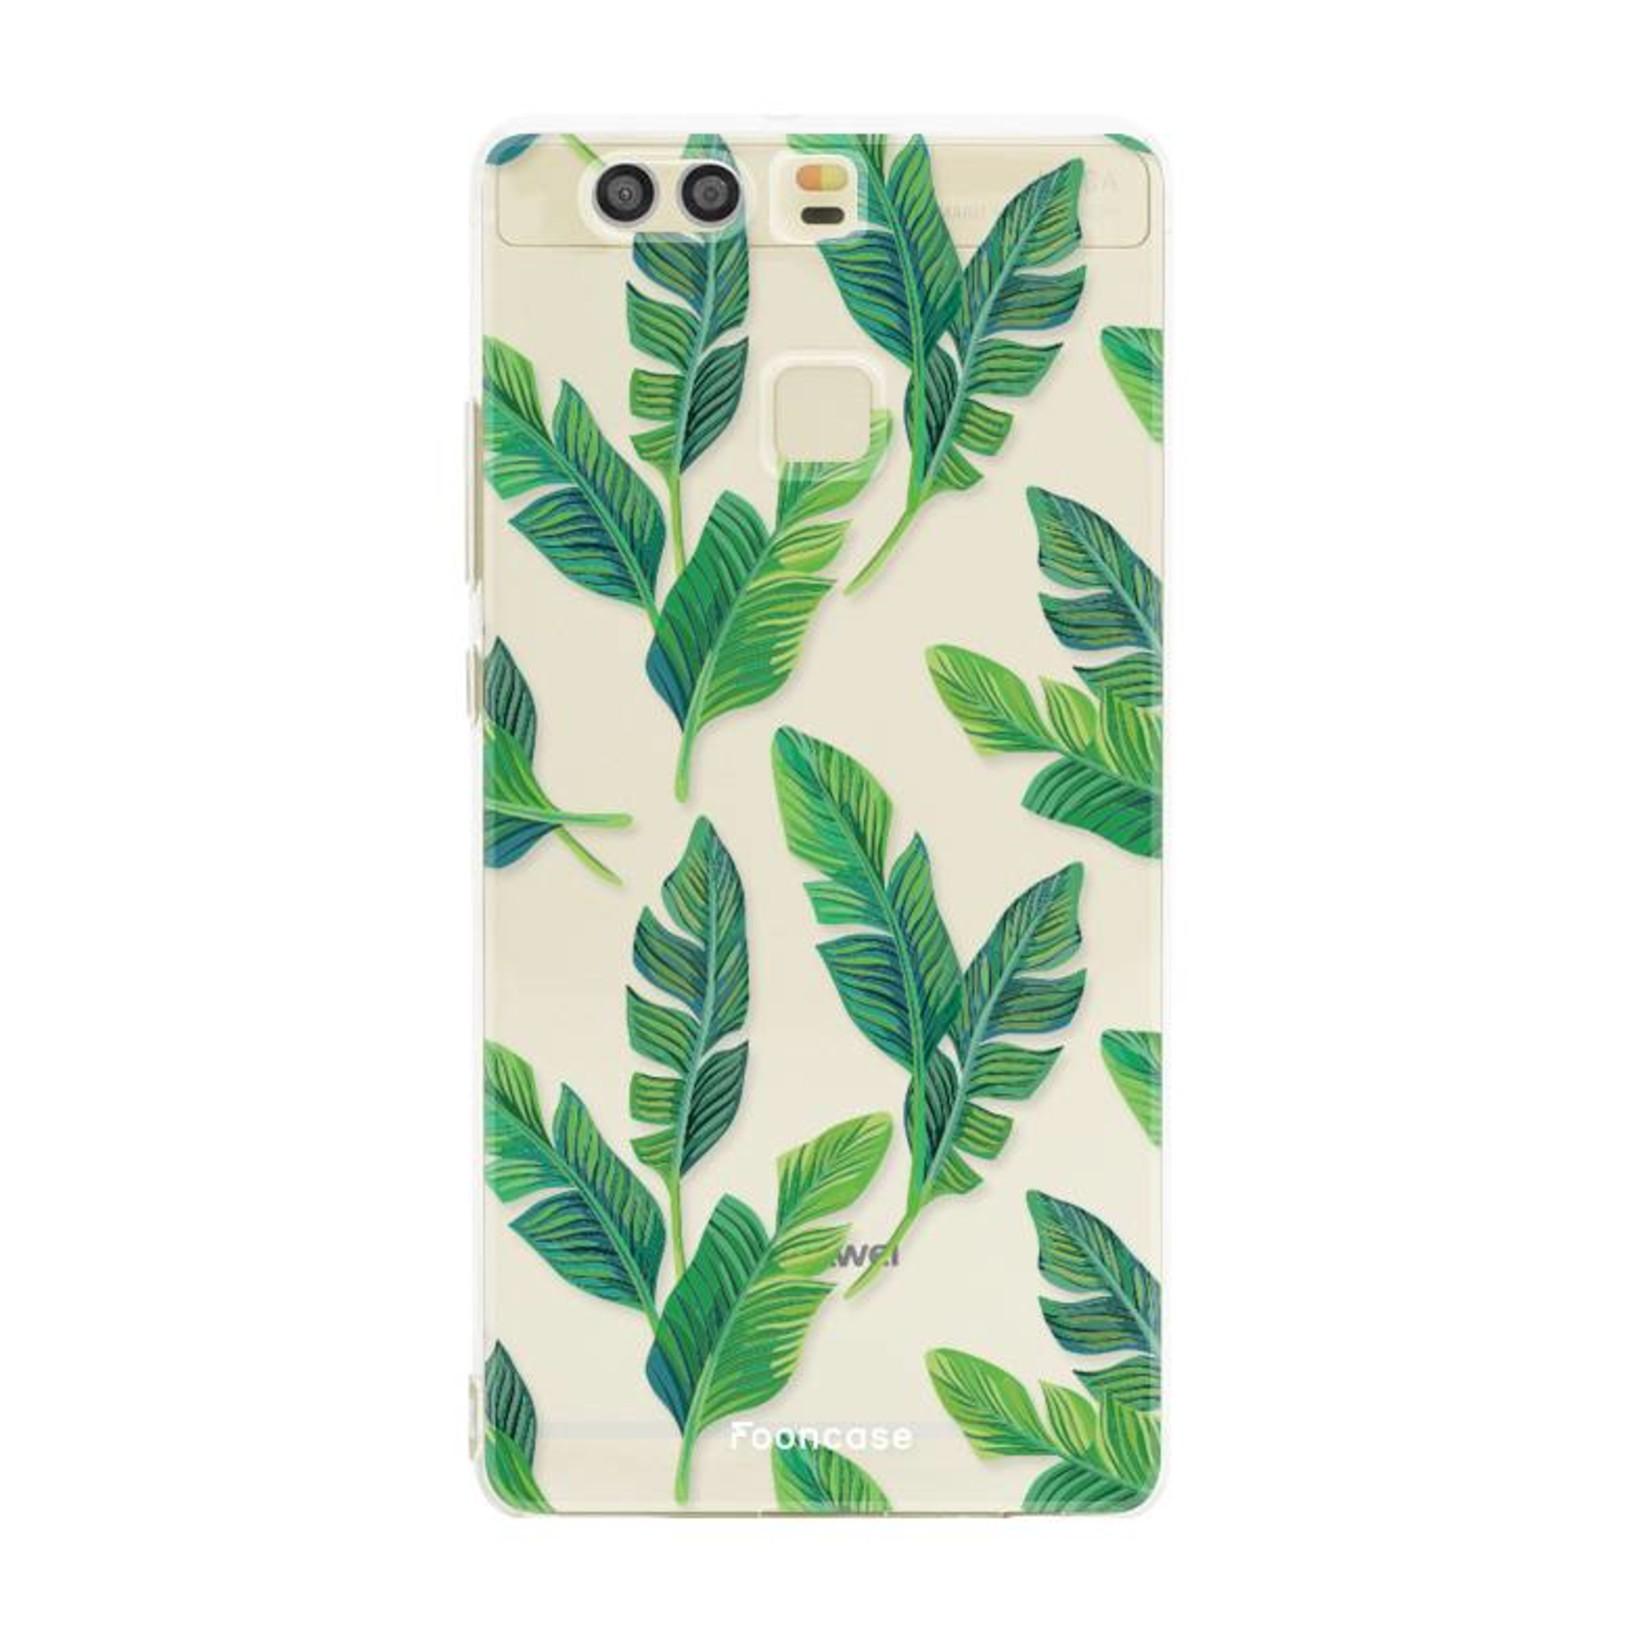 FOONCASE Huawei P9 hoesje TPU Soft Case - Back Cover - Banana leaves / Bananen bladeren